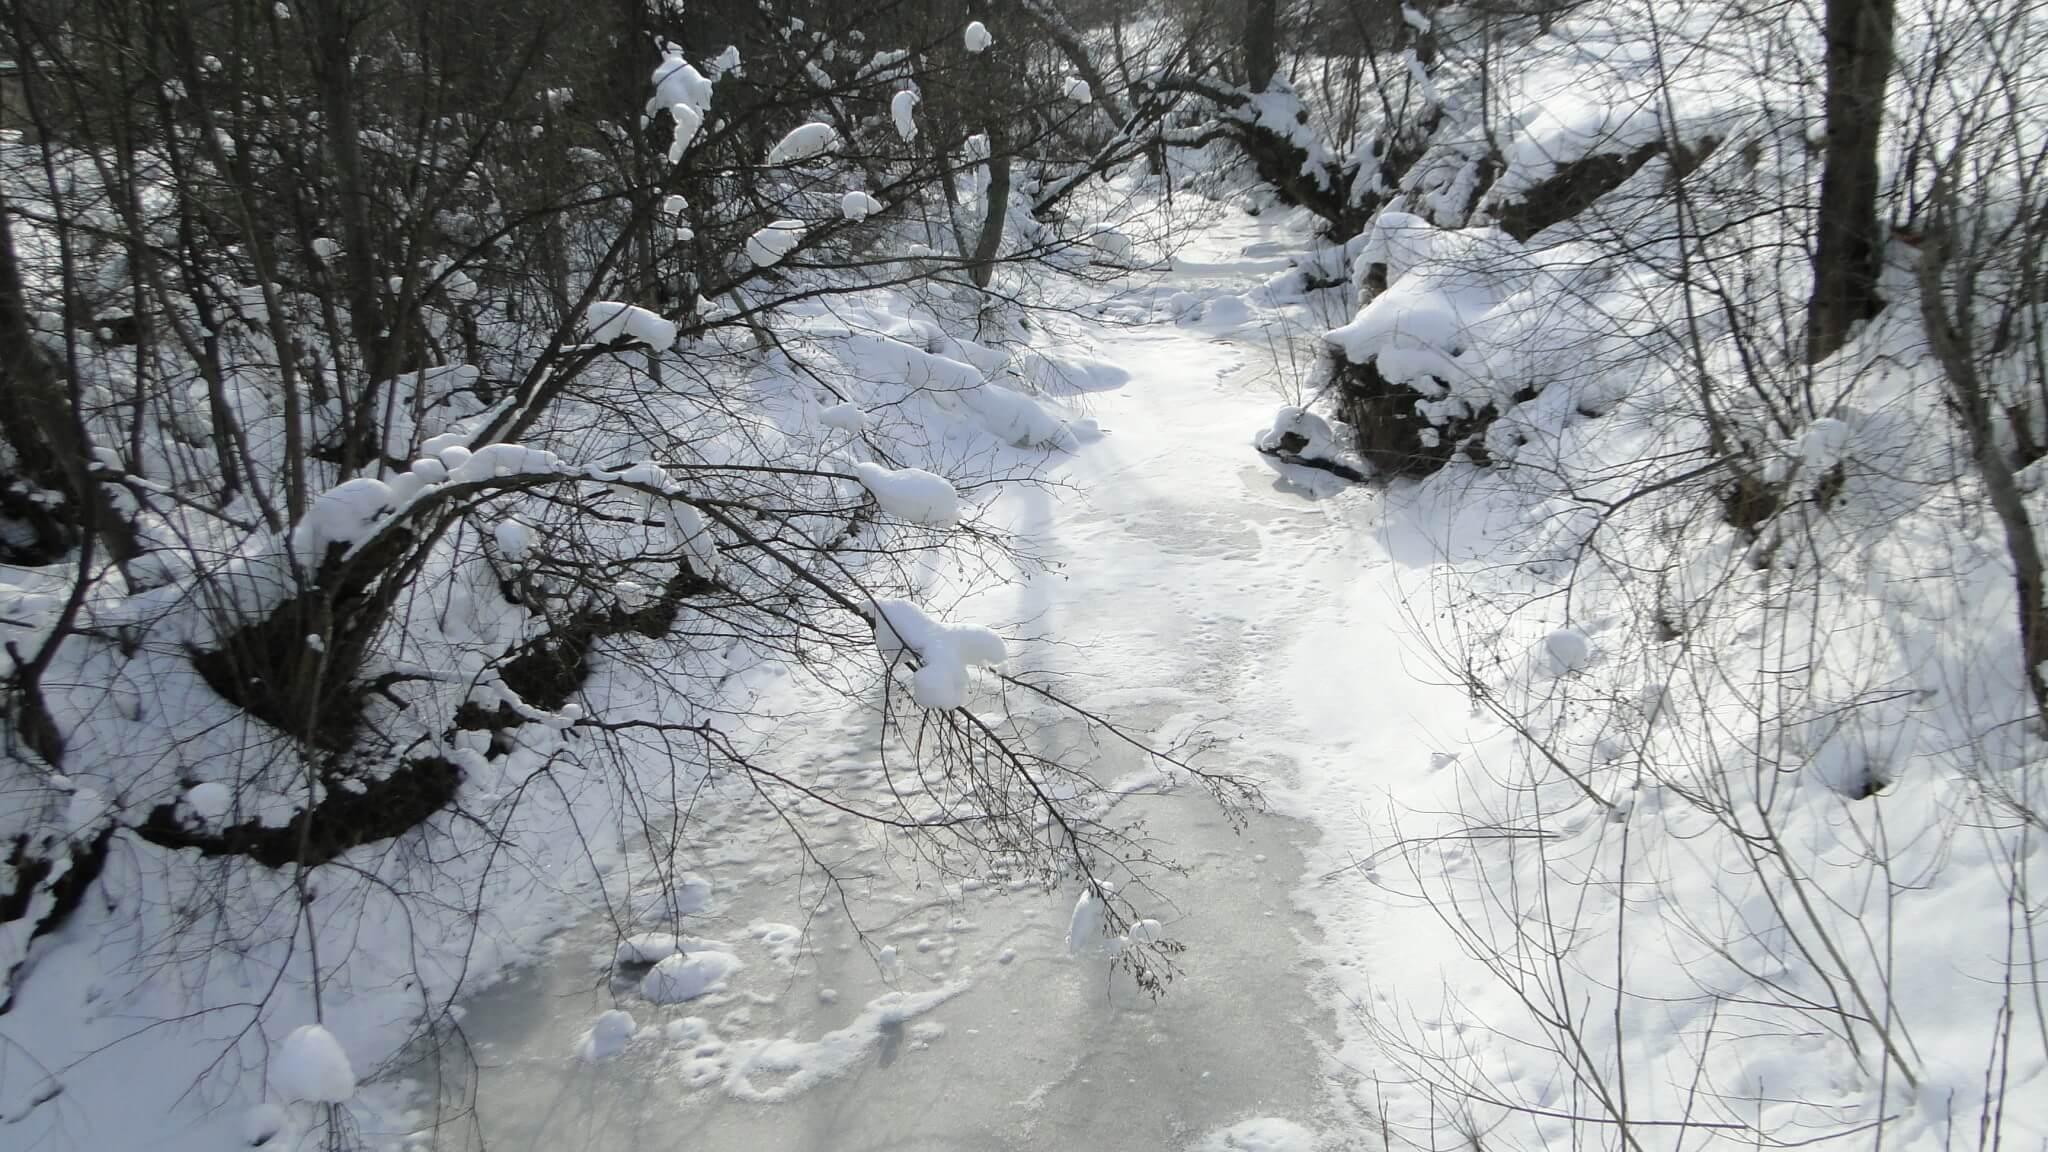 Lutowa zima - śnieżna i mroźna 31